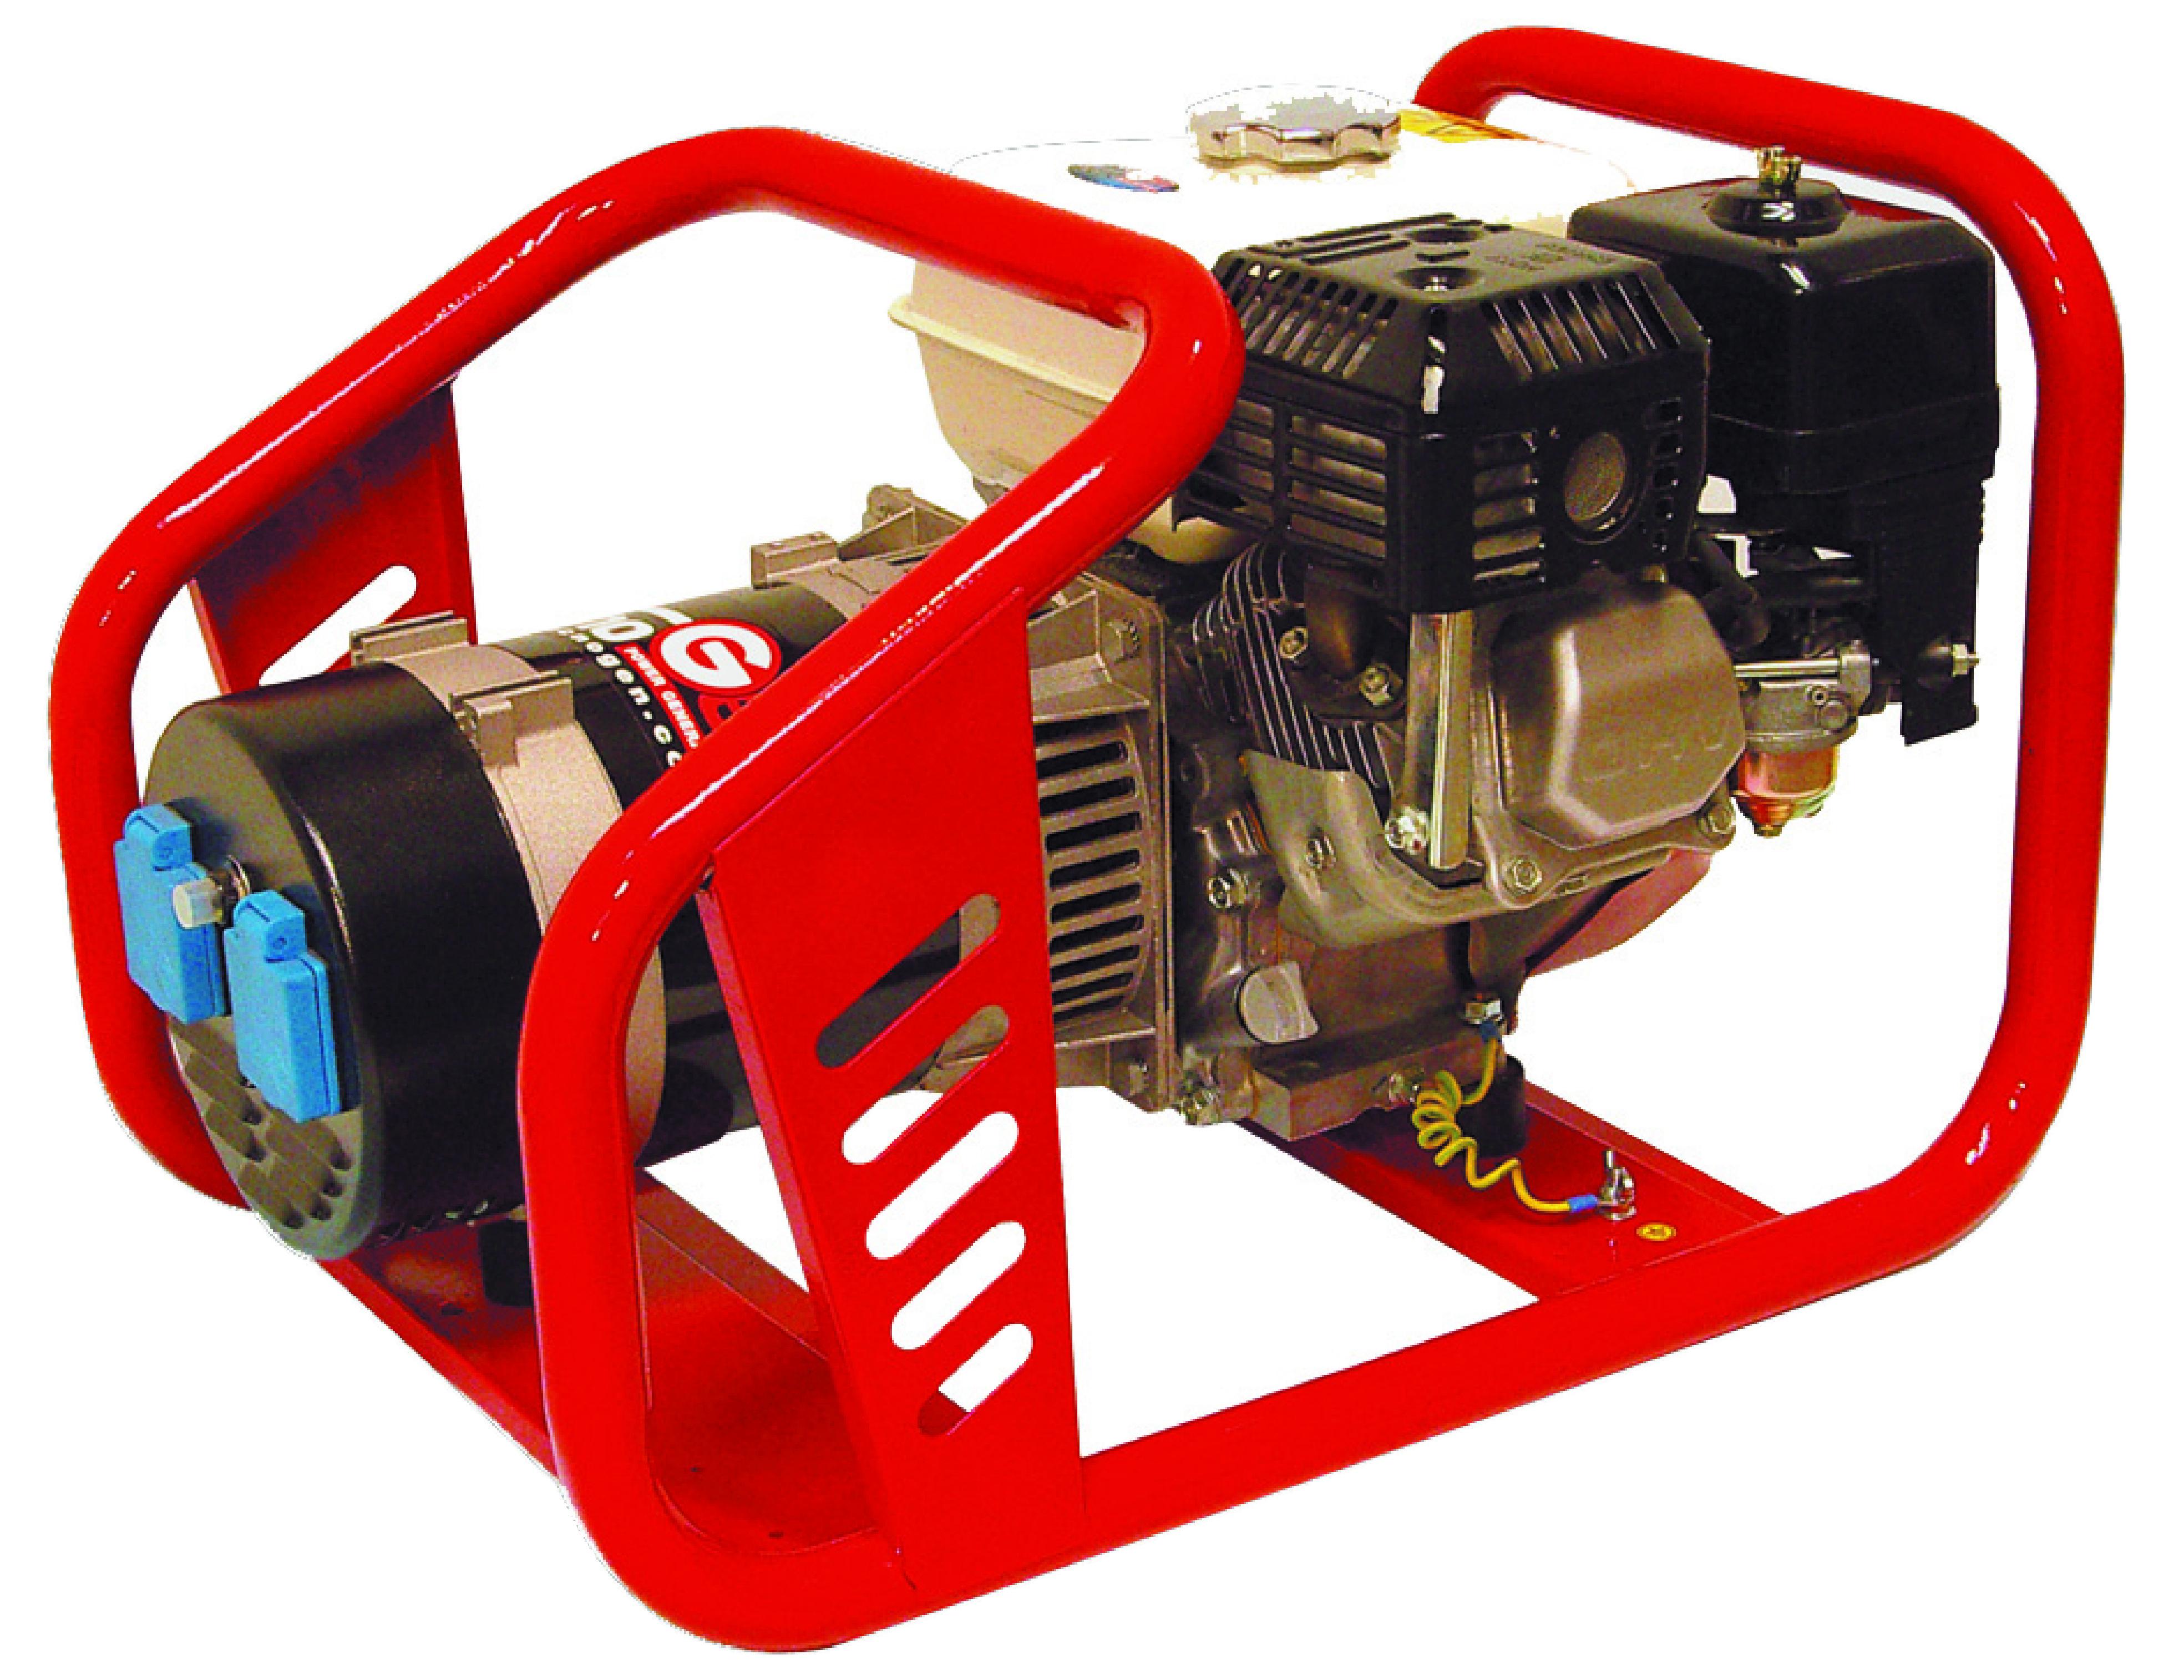 Image of Generatore di corrente TecnoGen H3500